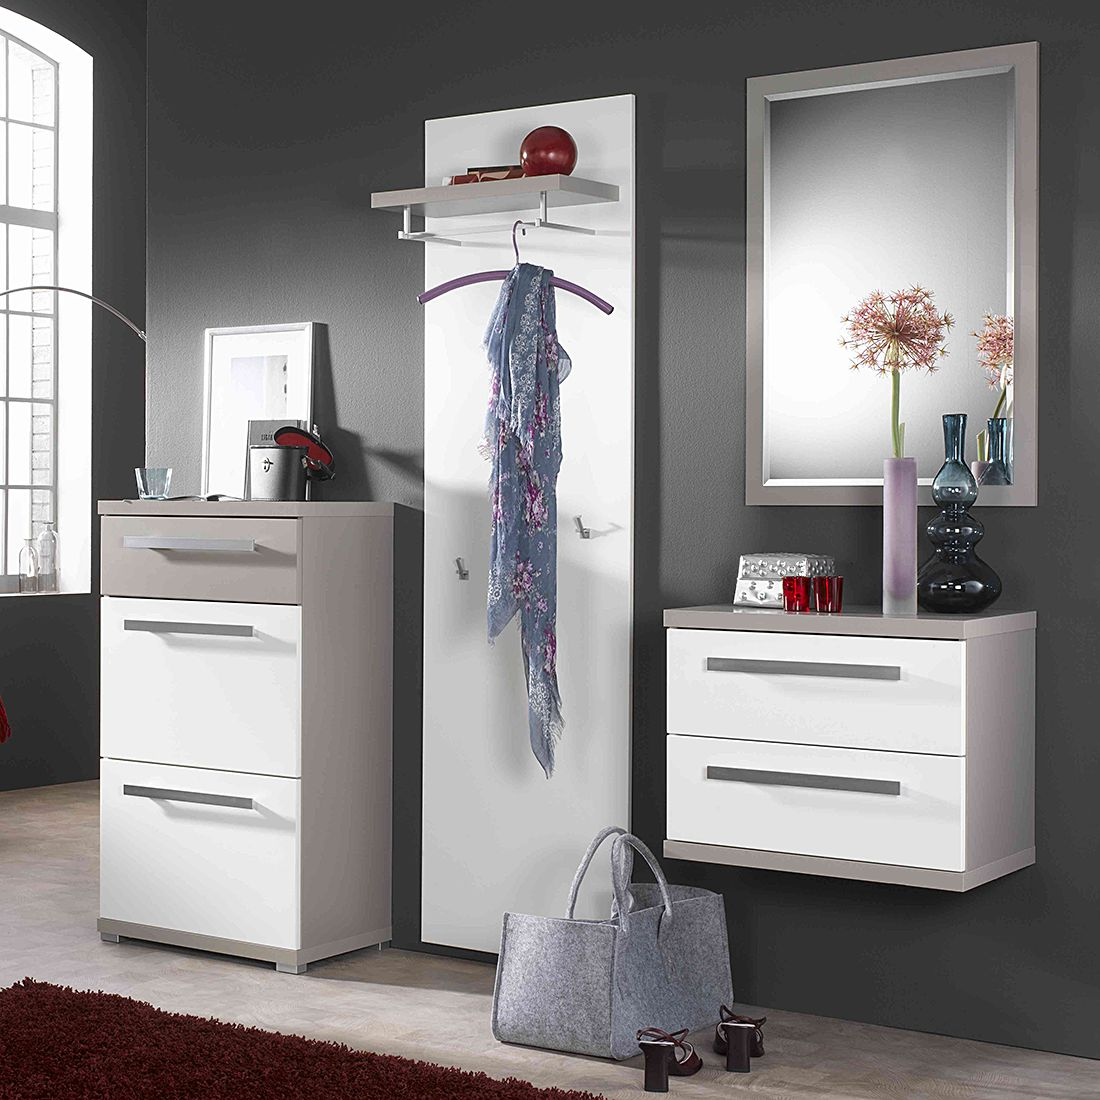 garderobenset buono ii 3 teilig wei hochglanz gr n. Black Bedroom Furniture Sets. Home Design Ideas